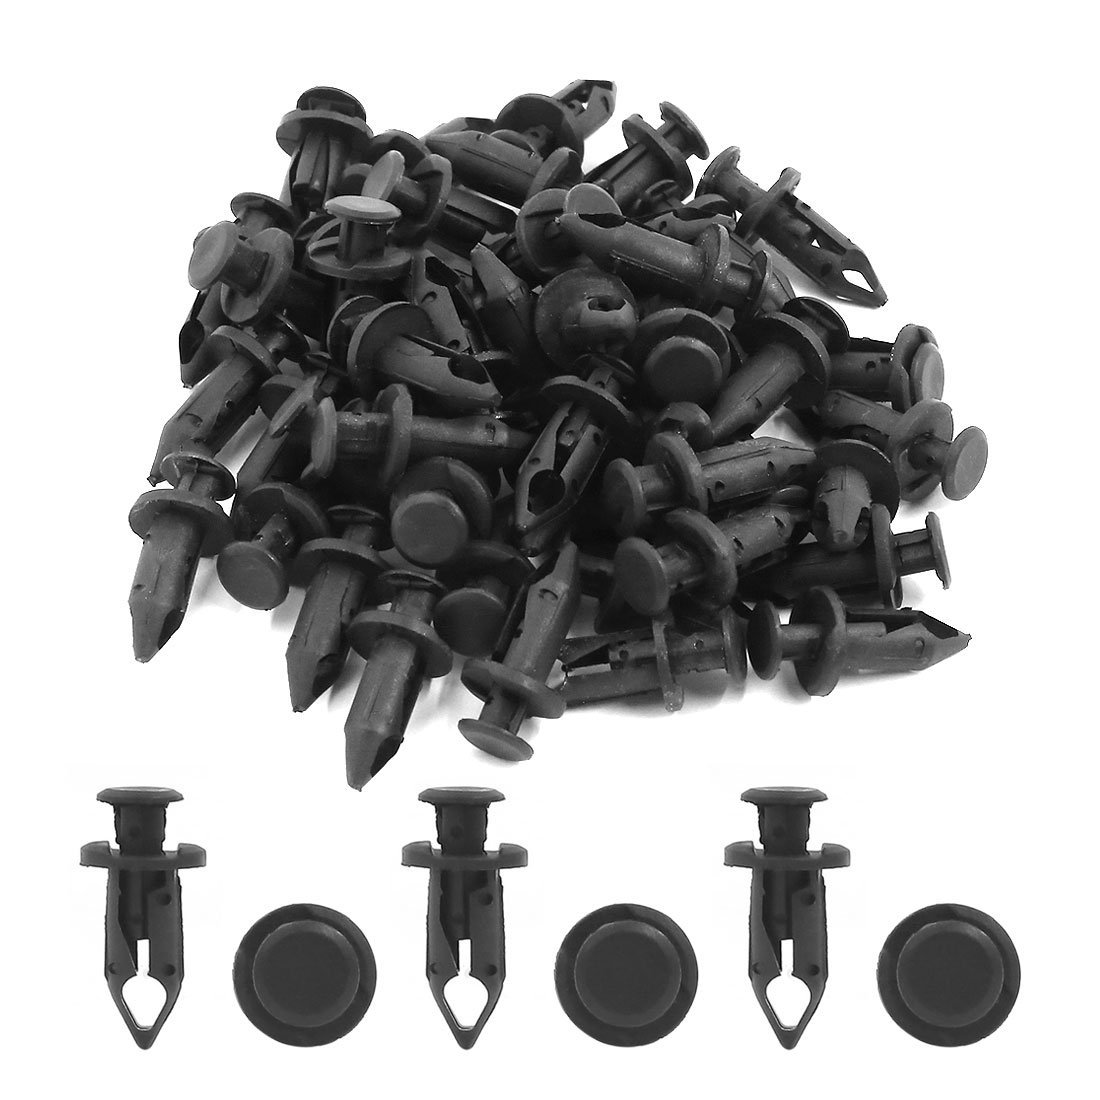 Amazon.com: eDealMax 50 Pcs Universal del coche de parachoques Fender 8mm agujero remaches de plástico recorte sujetadores Negro: Automotive